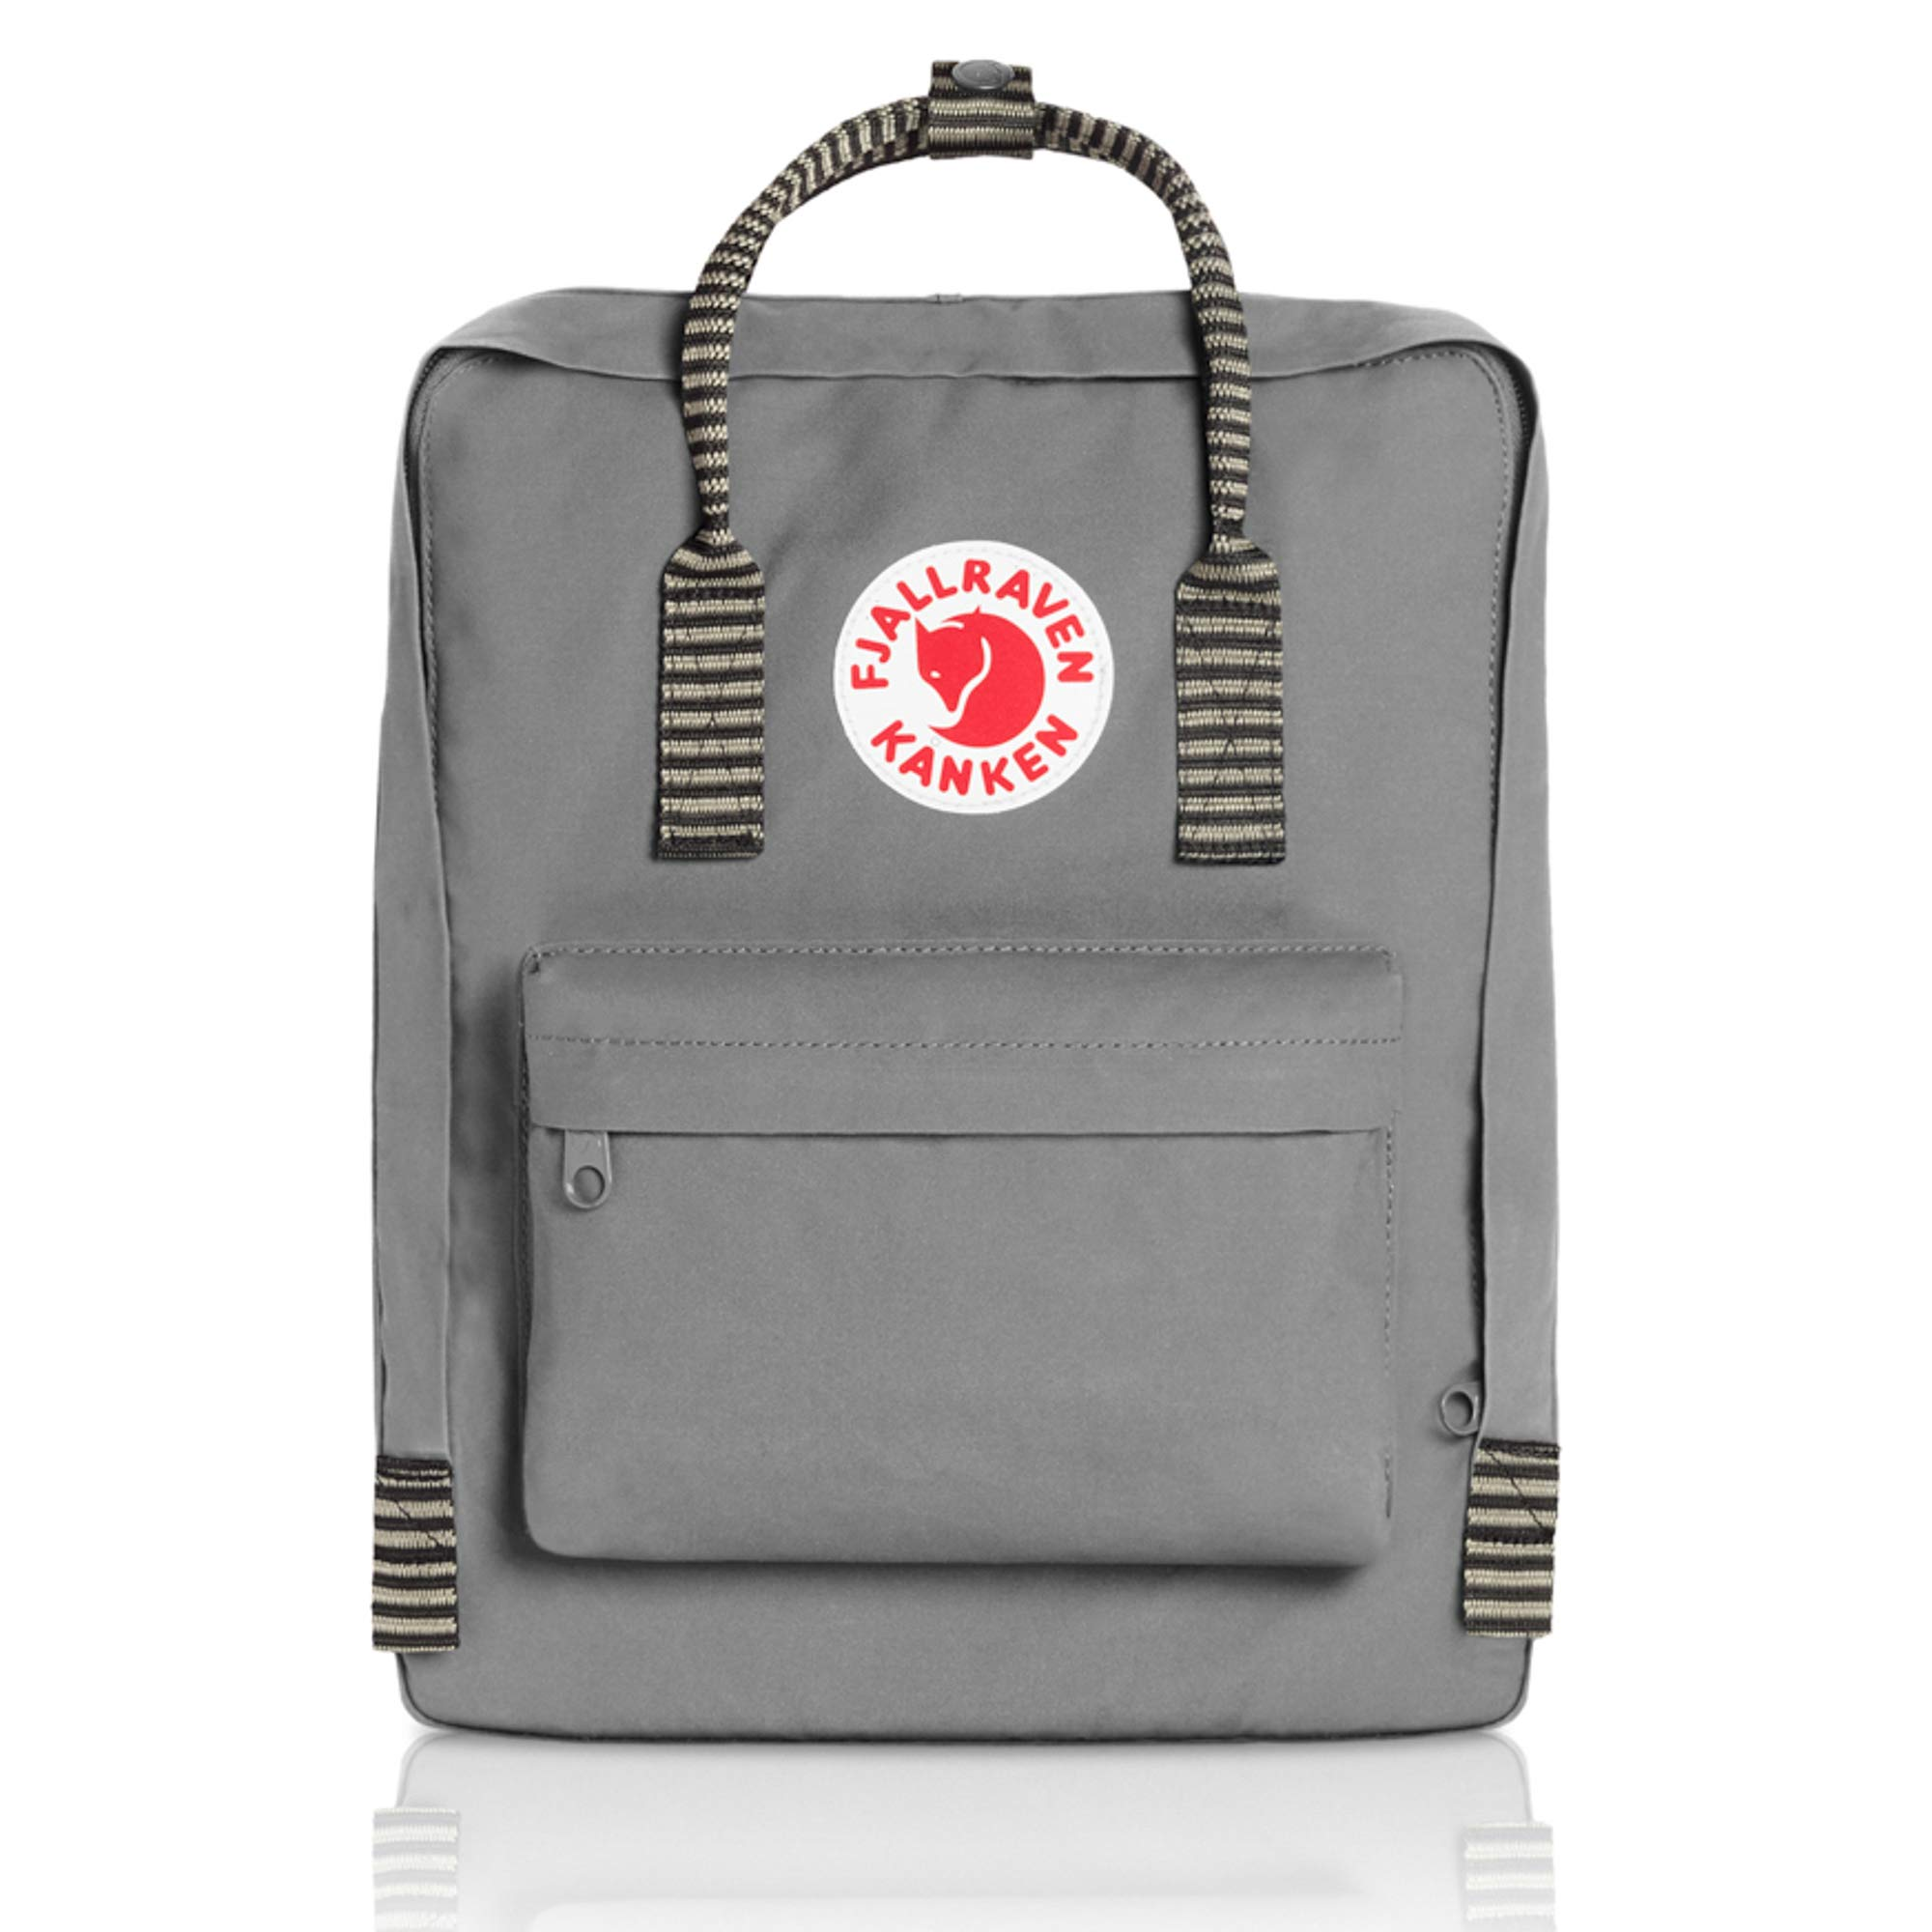 Fjallraven - Kanken Classic Backpack for Everyday, Fog-Striped